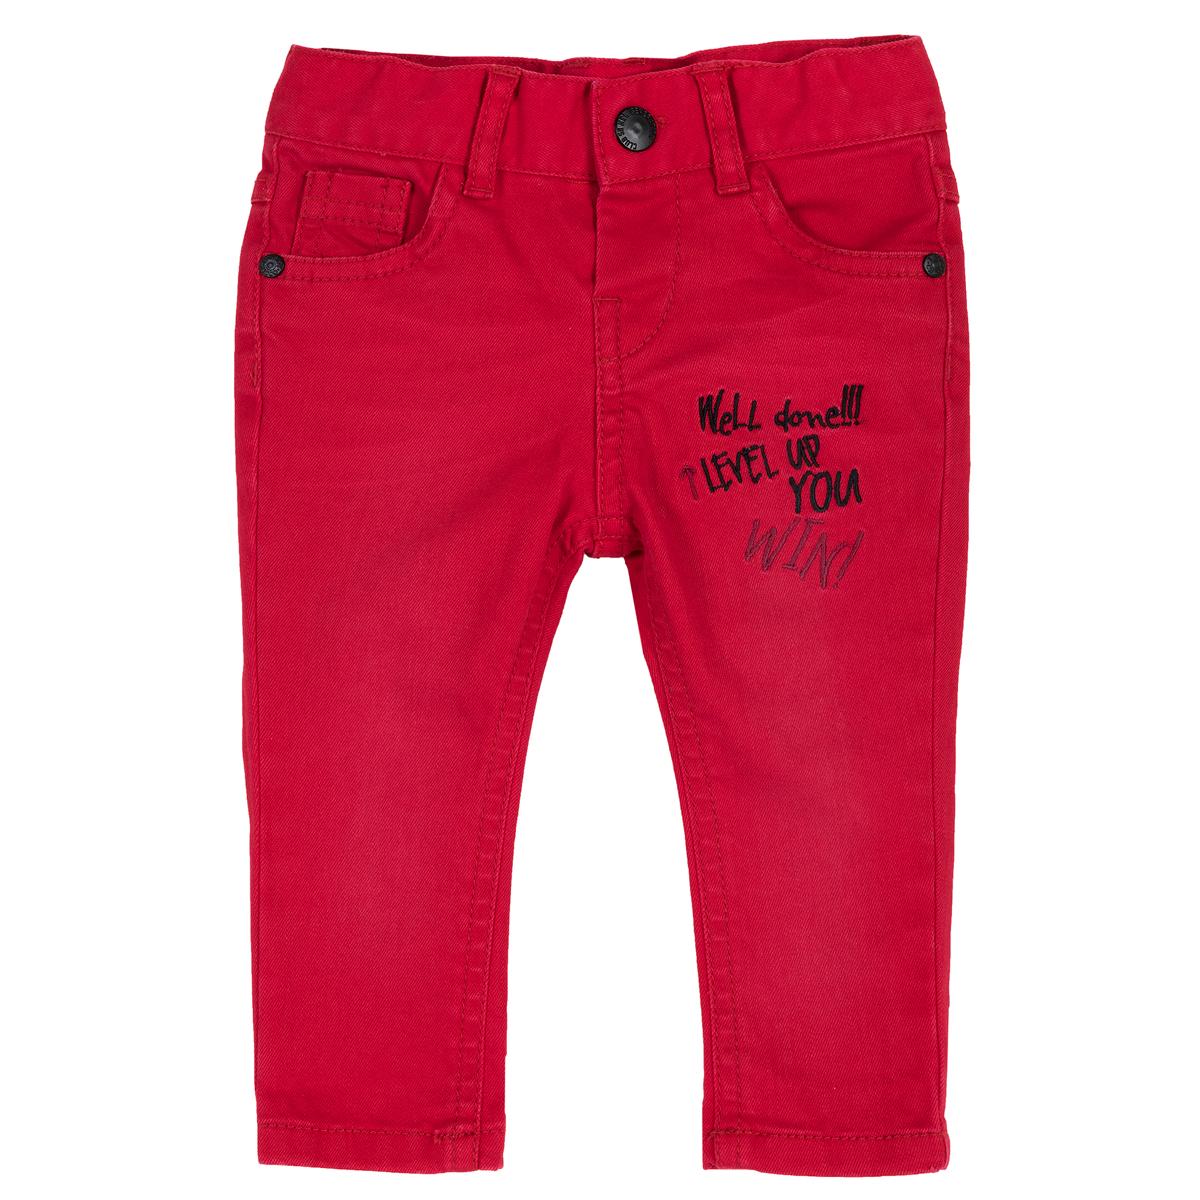 Pantalong lung copii Chicco, rosu, 08015 din categoria Pantaloni copii